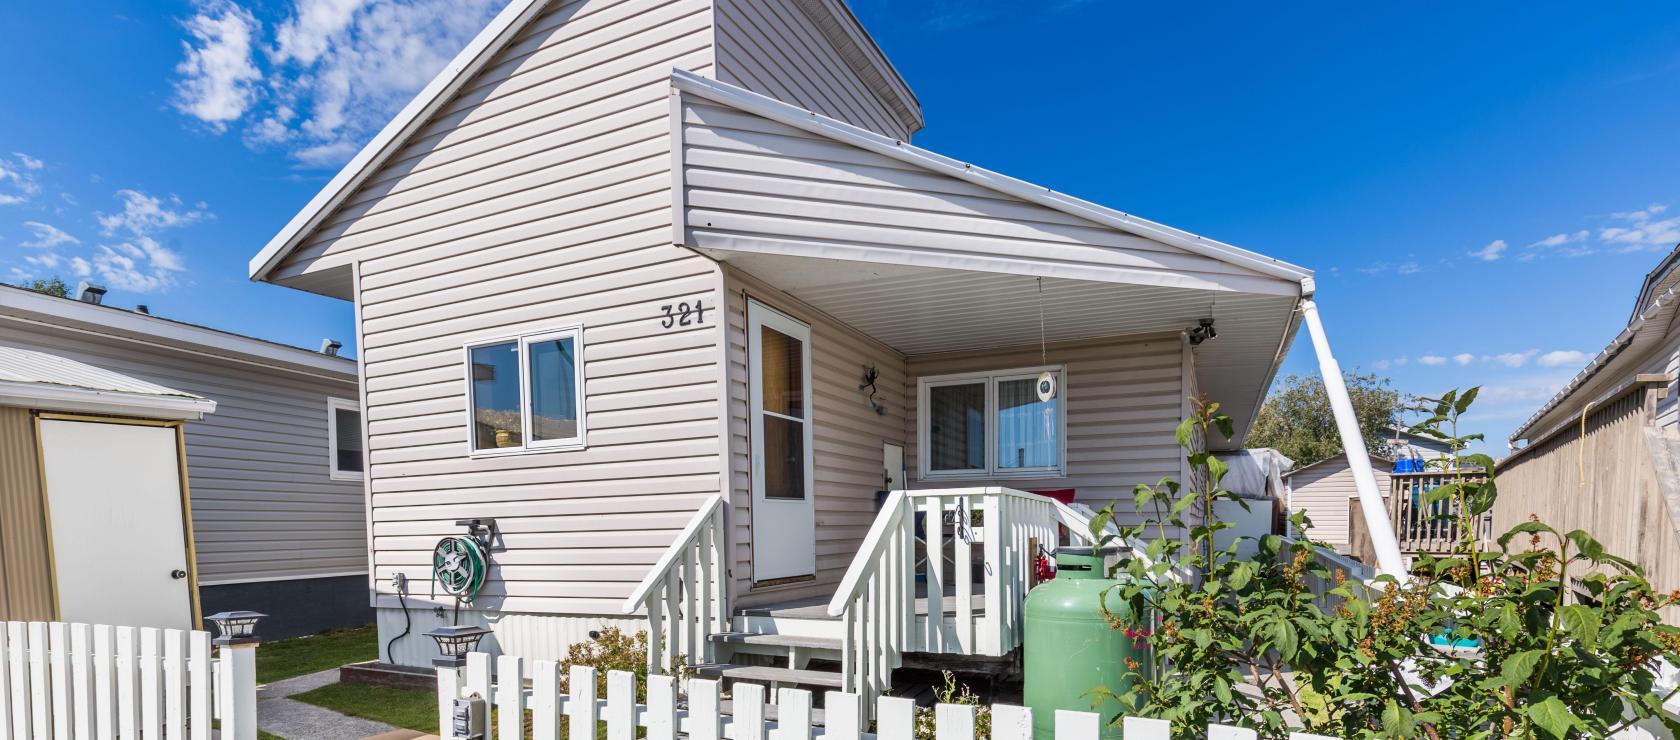 321 Bellanca Avenue, Frame Lake, Yellowknife 2